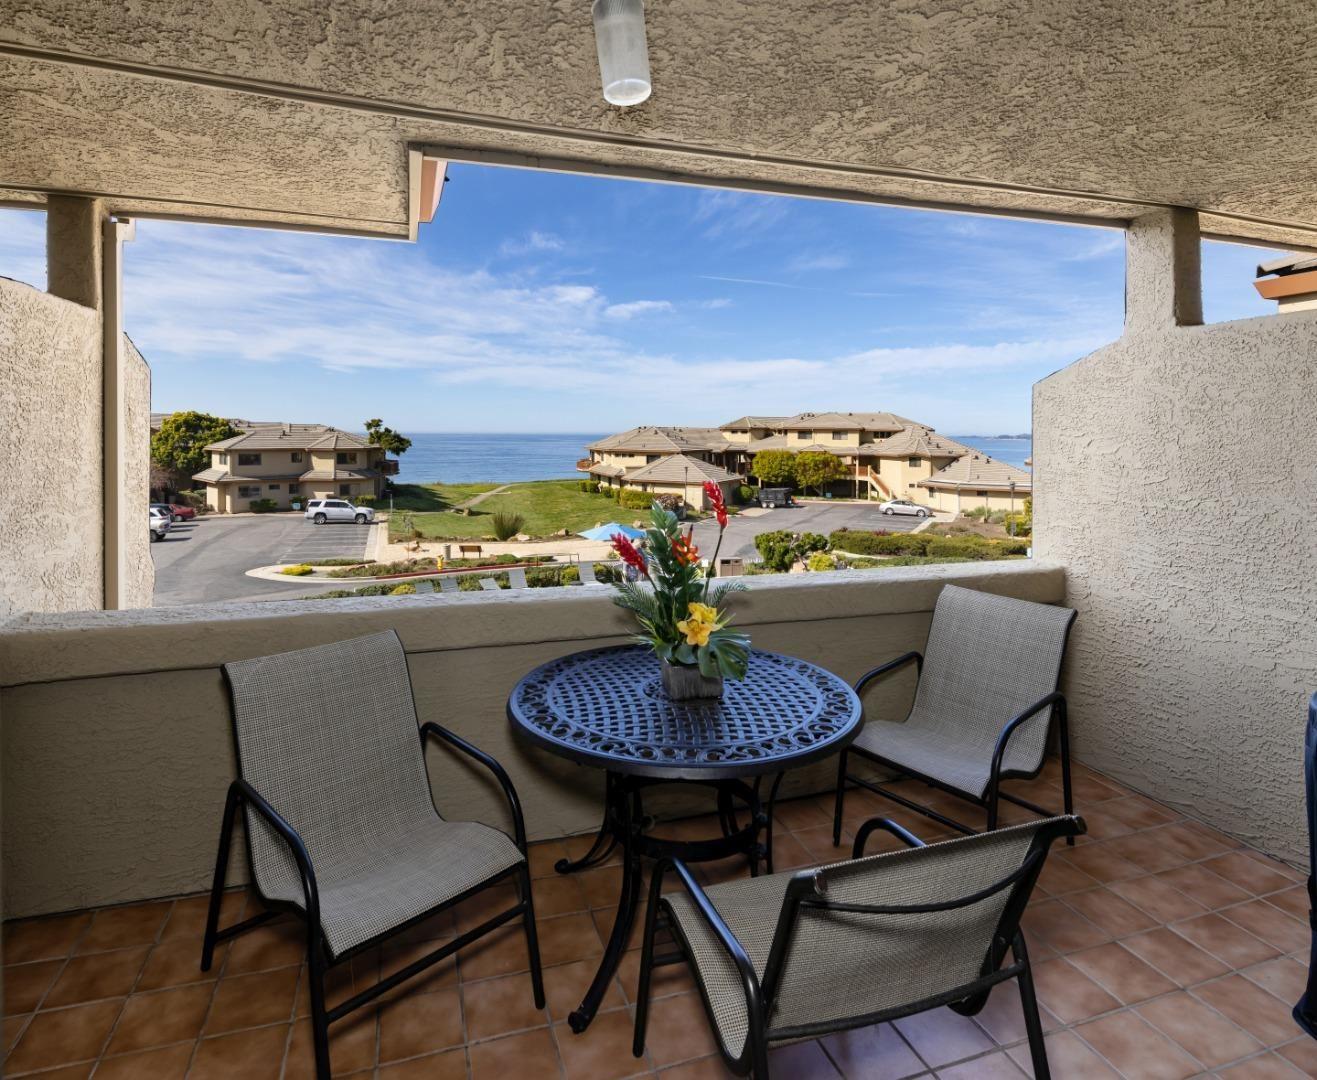 Photo for 16 Seascape Resort DR 16 #16, APTOS, CA 95003 (MLS # ML81836161)